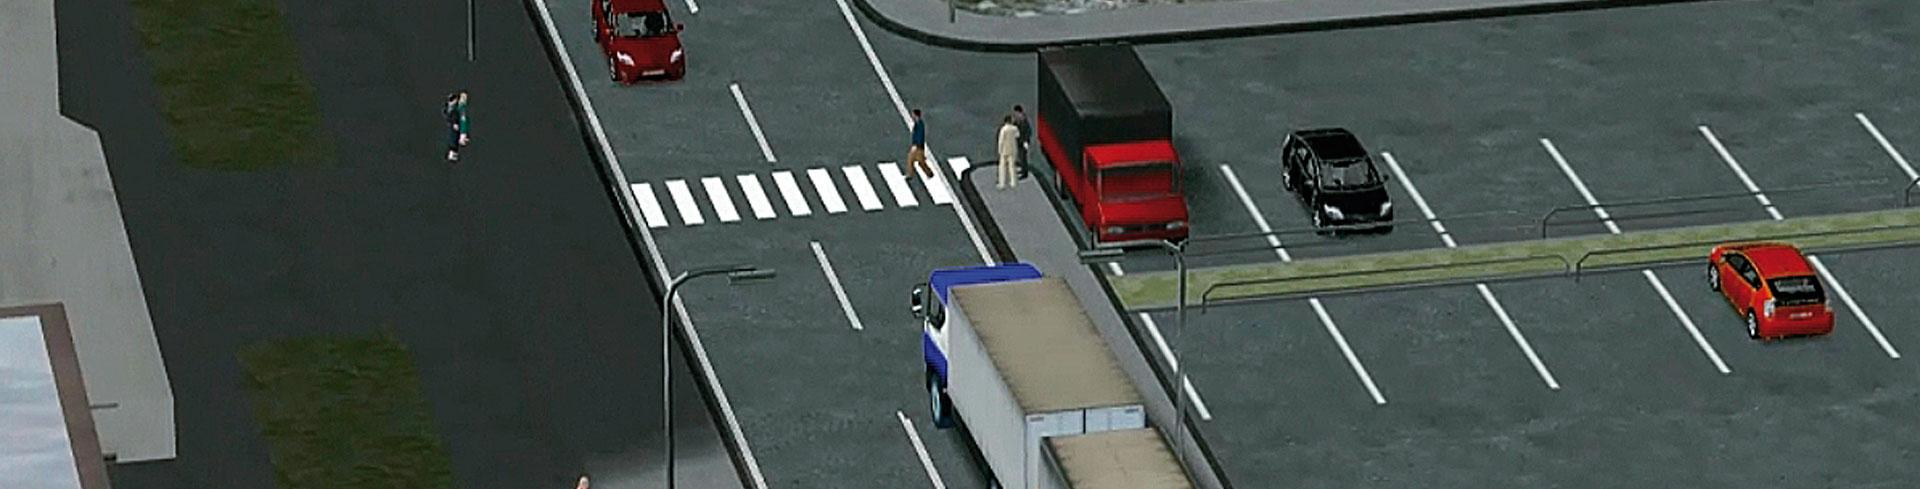 slide_gefahrensituation